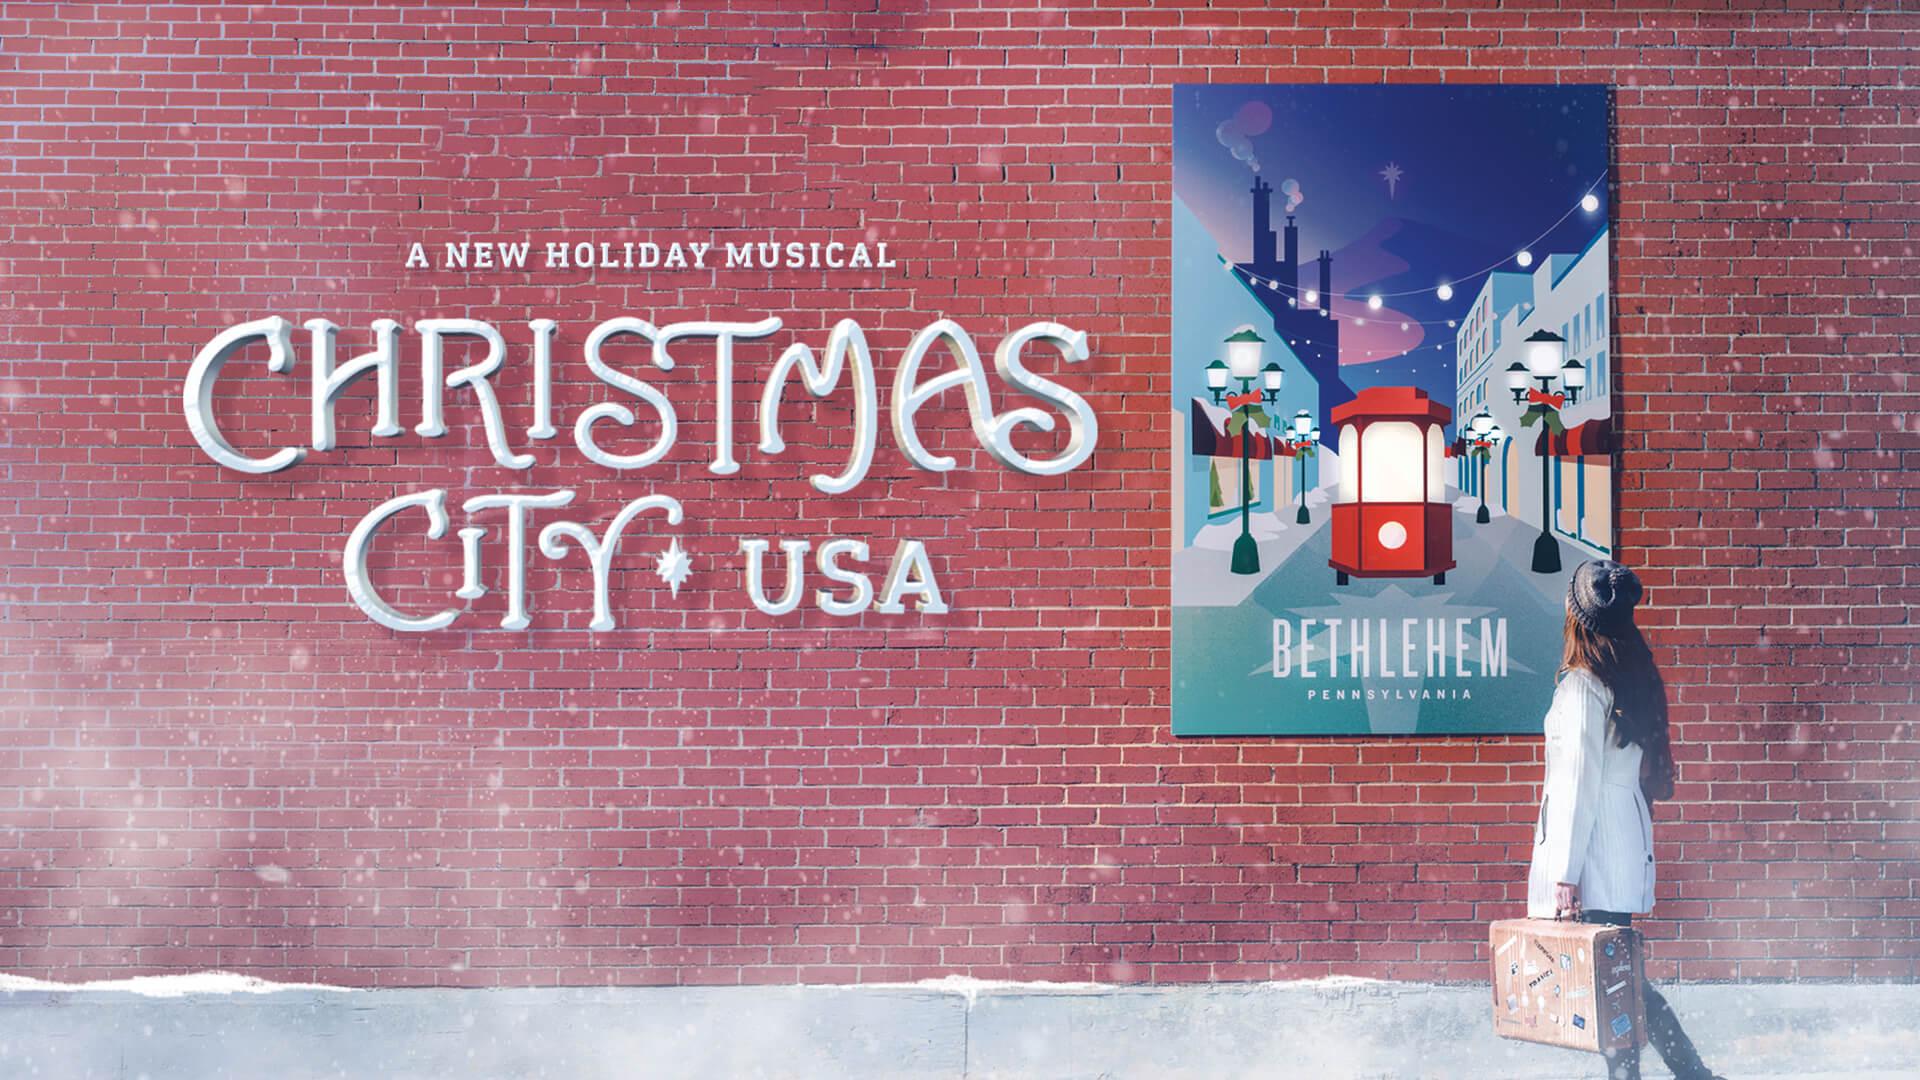 Gateway Church Southlake Christmas Musical 2020 Christmas City, USA | A New Holiday Musical | Gateway Church